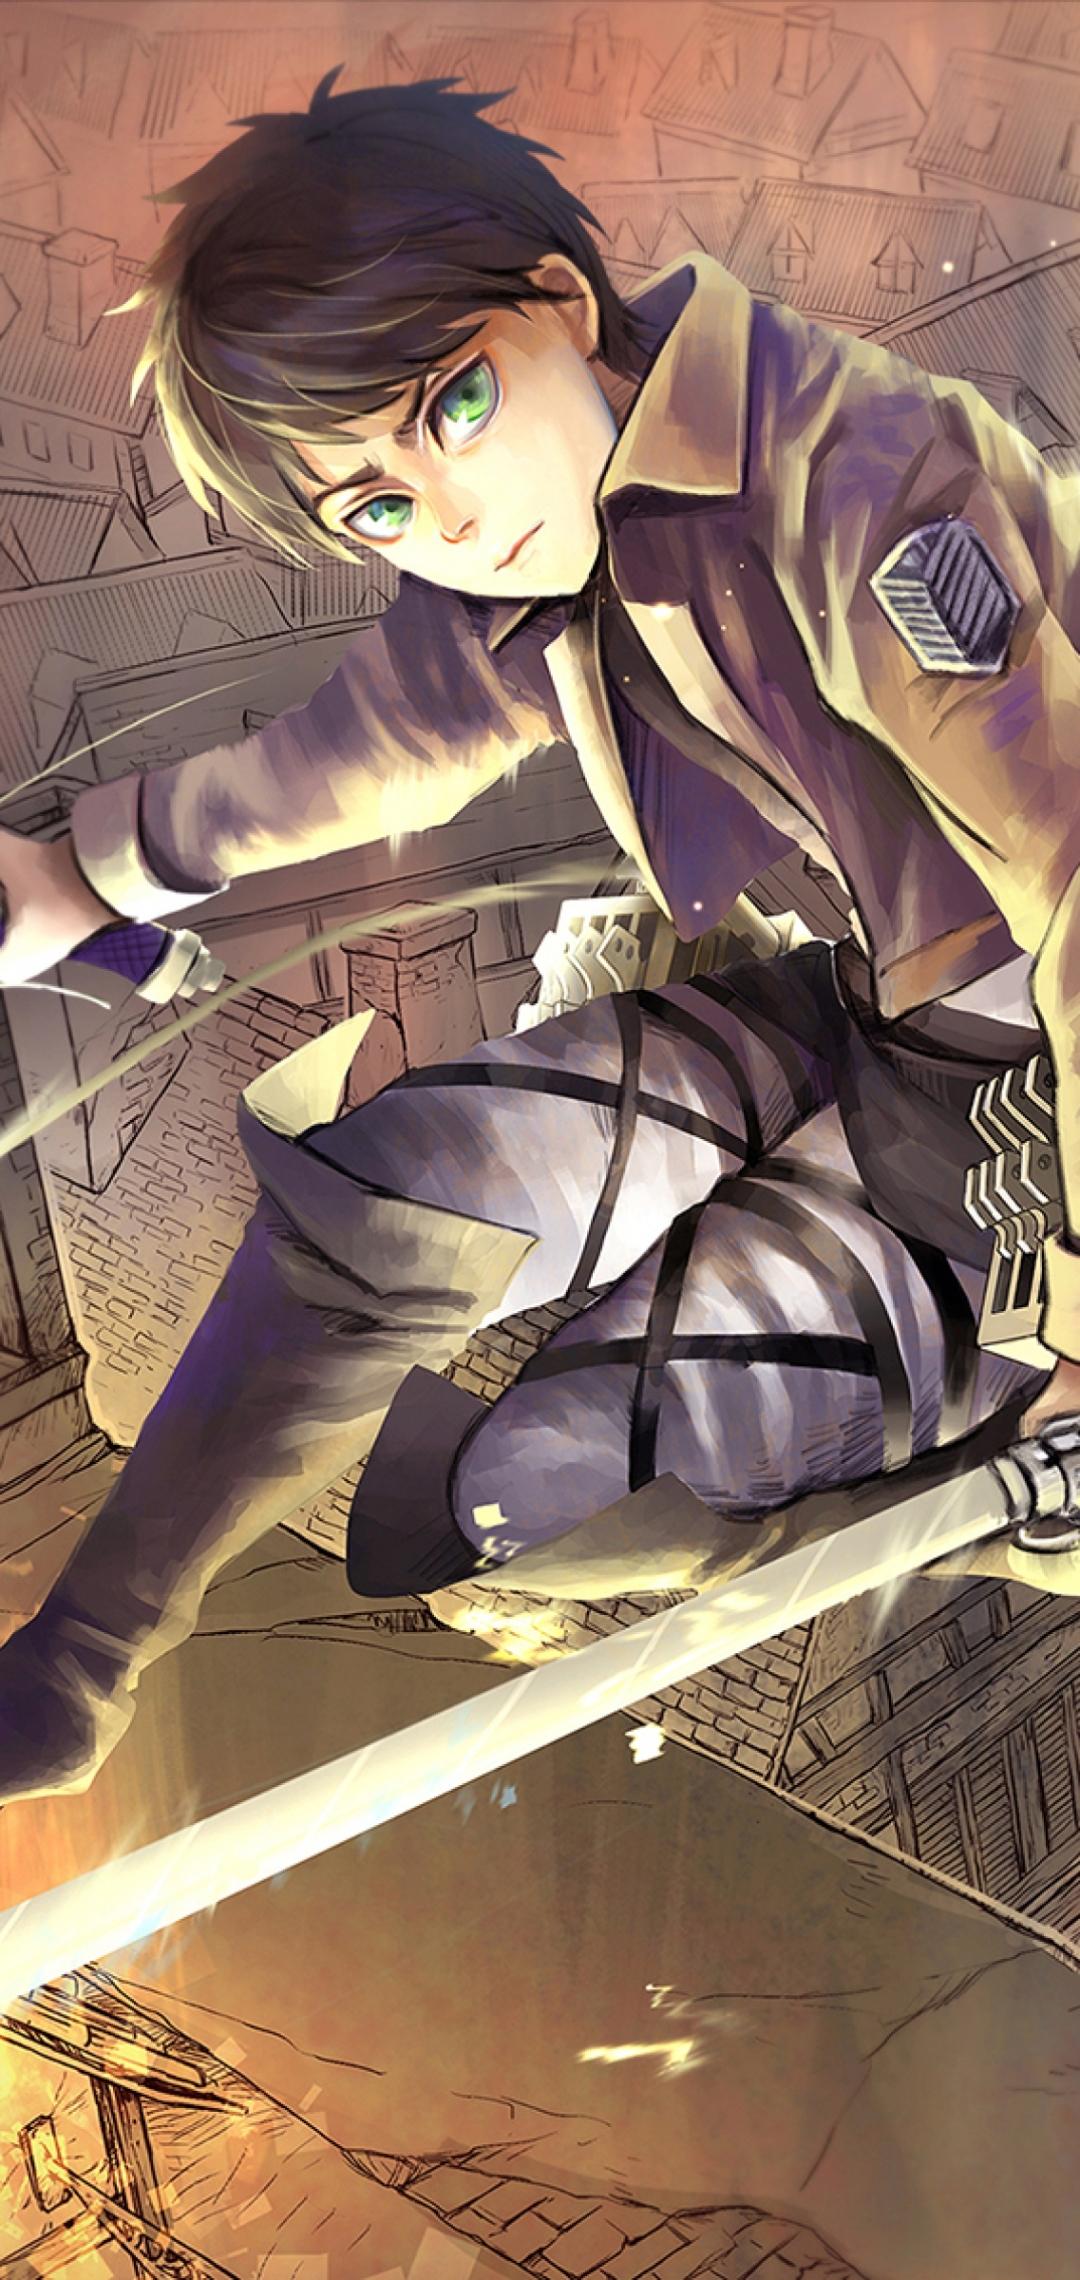 Attack On Titan Wallpaper Iphone 7 Plus Iphone 6 Plus For